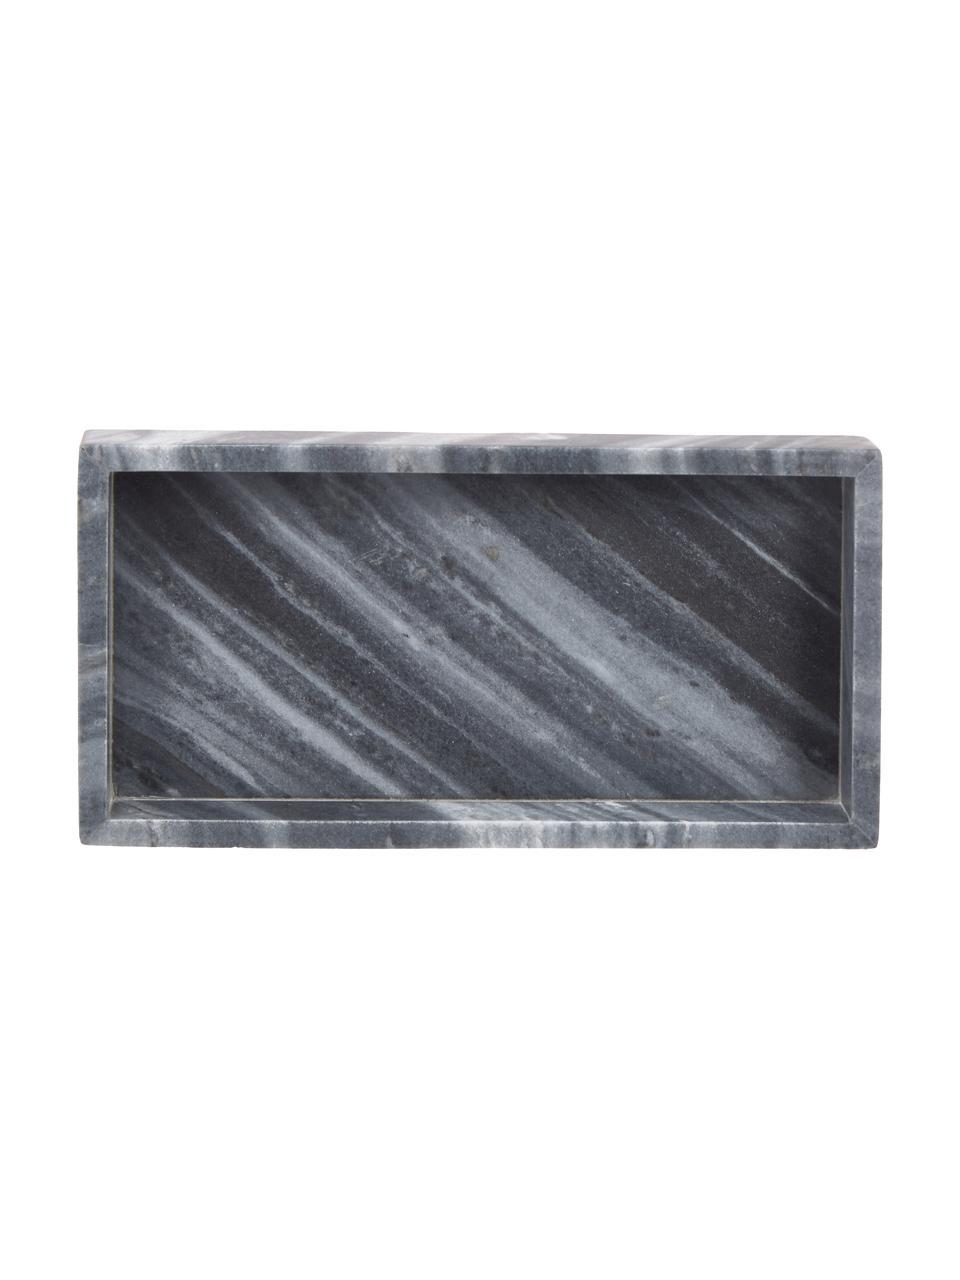 Deko-Marmor-Tablett Sienna in Grau, Marmor, Grau, 15 x 4 cm